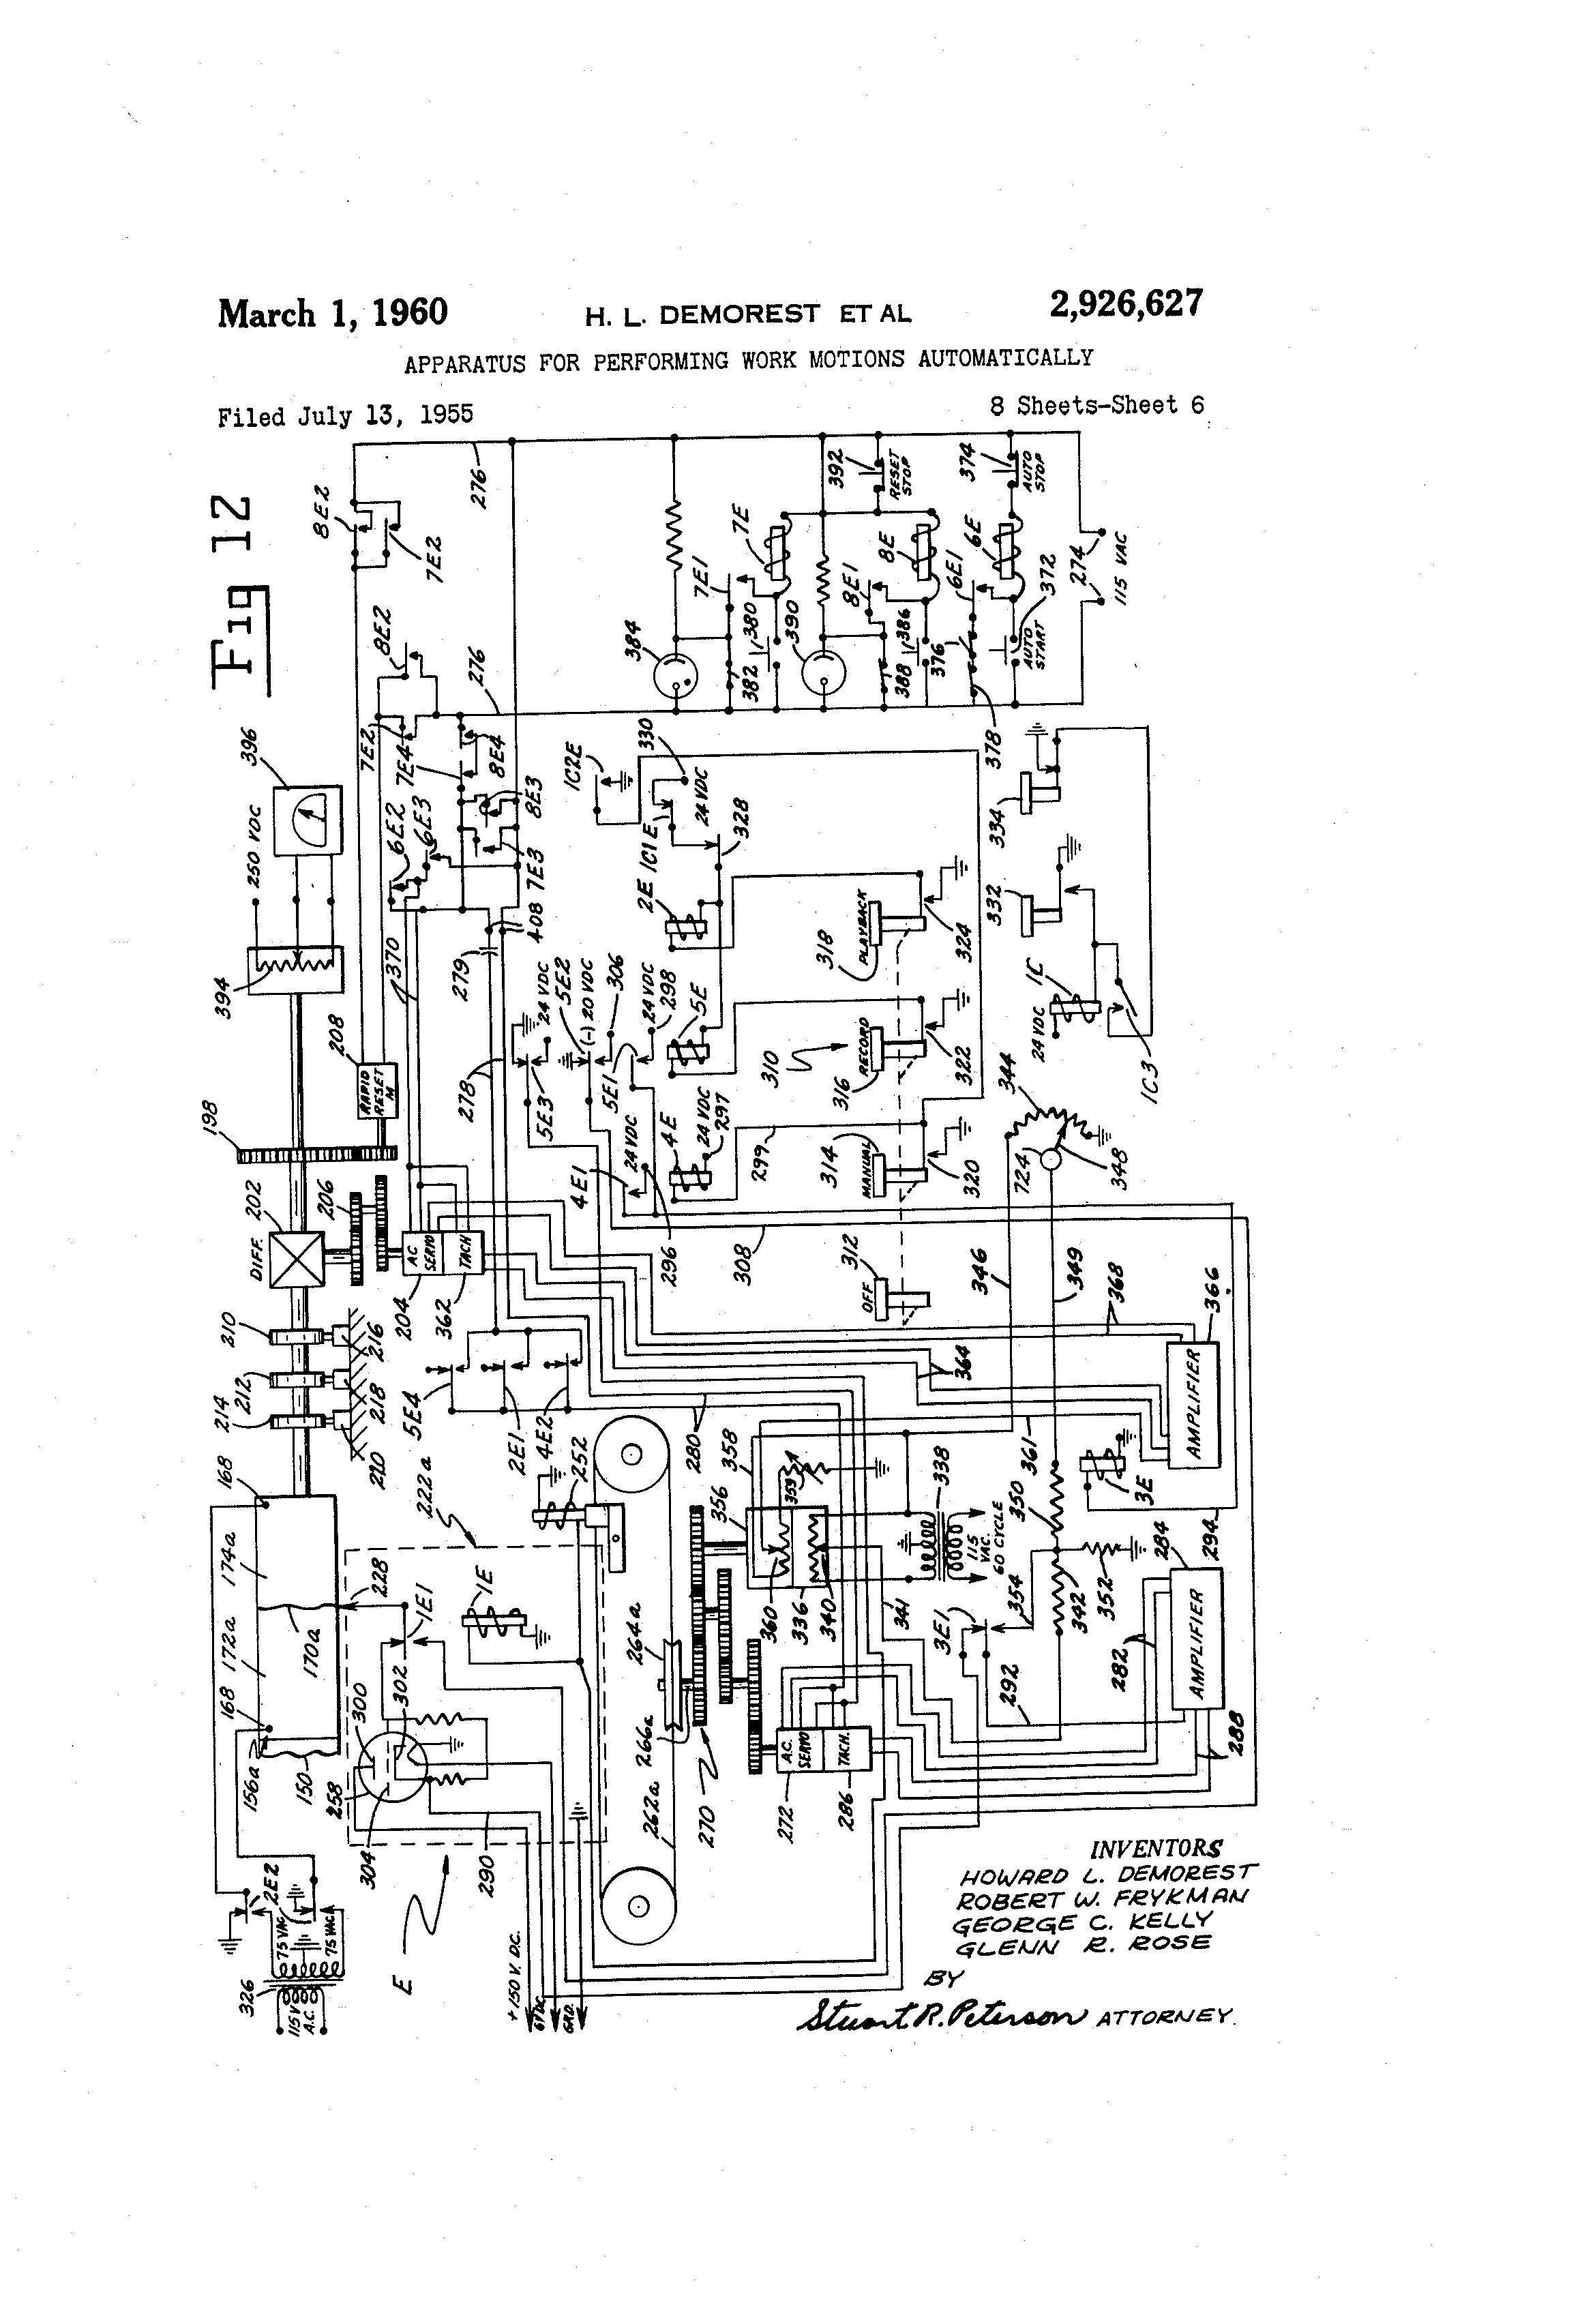 Dicktator 60 2 Wiring Diagram Wiring Diagrams And Schematics – Dicktator Wiring Diagram